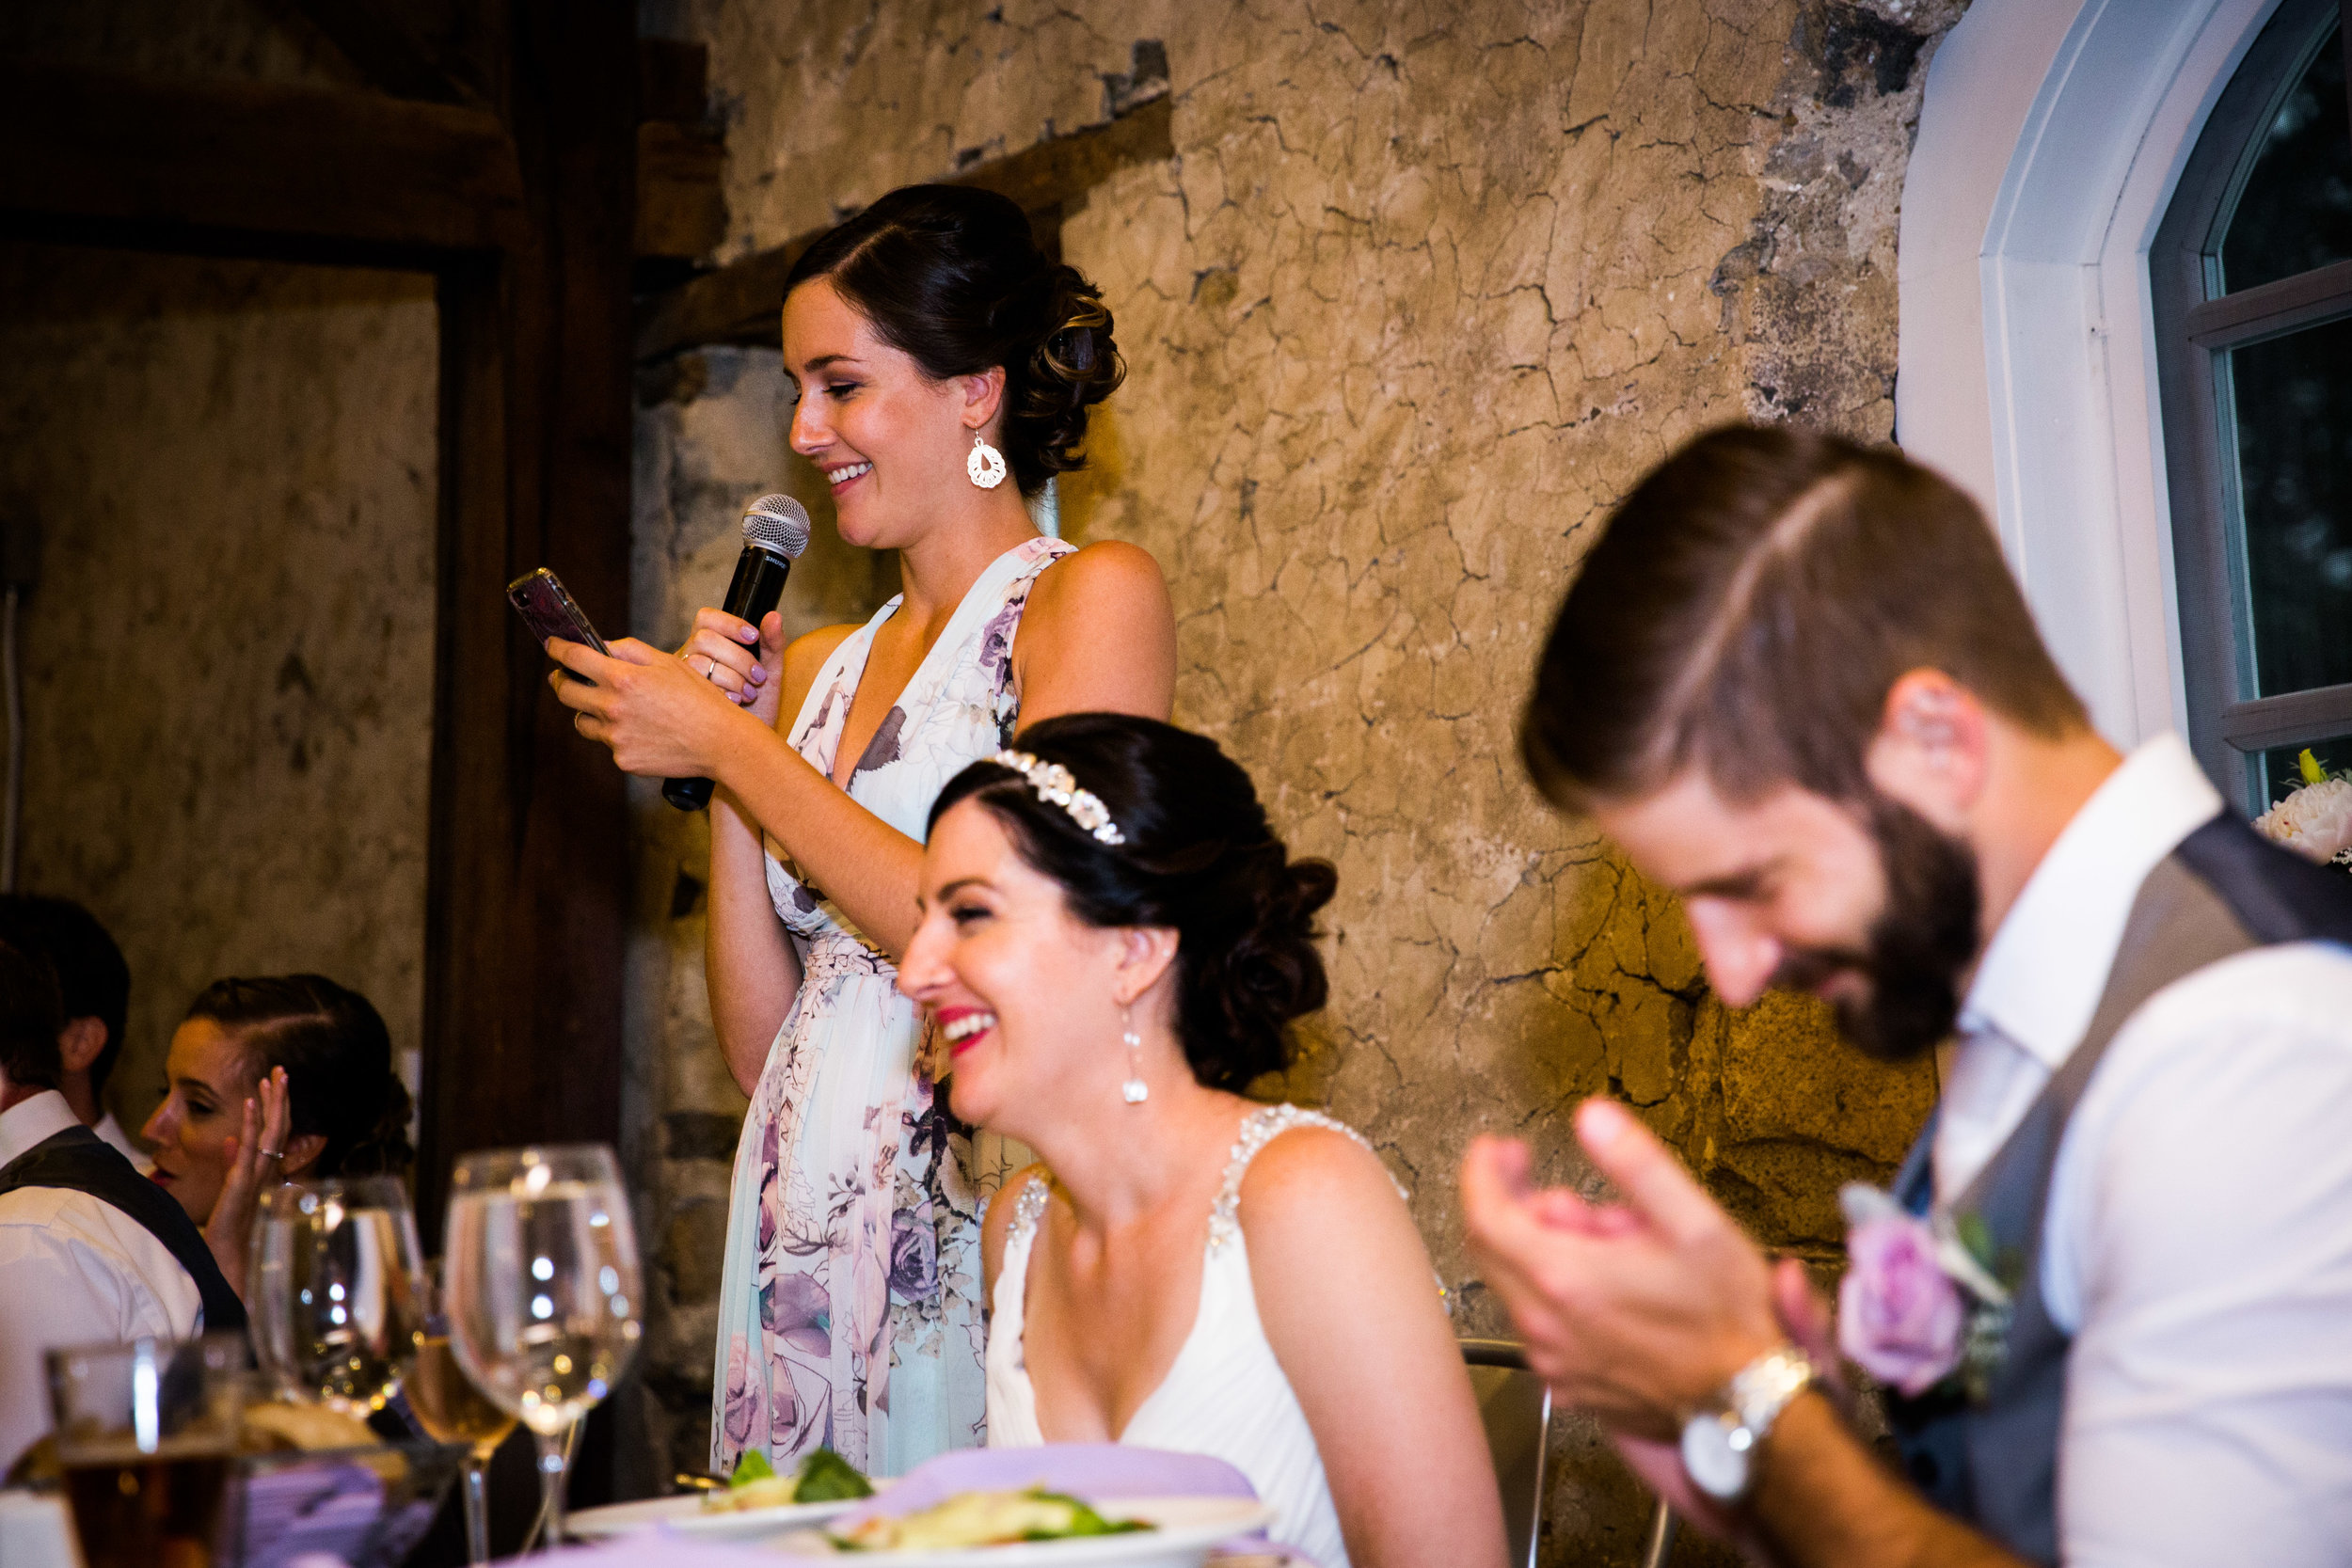 TYLER ARBORETUM WEDDING PHOTOGRAPHY LOVESTRUCK PICTURES-087.jpg